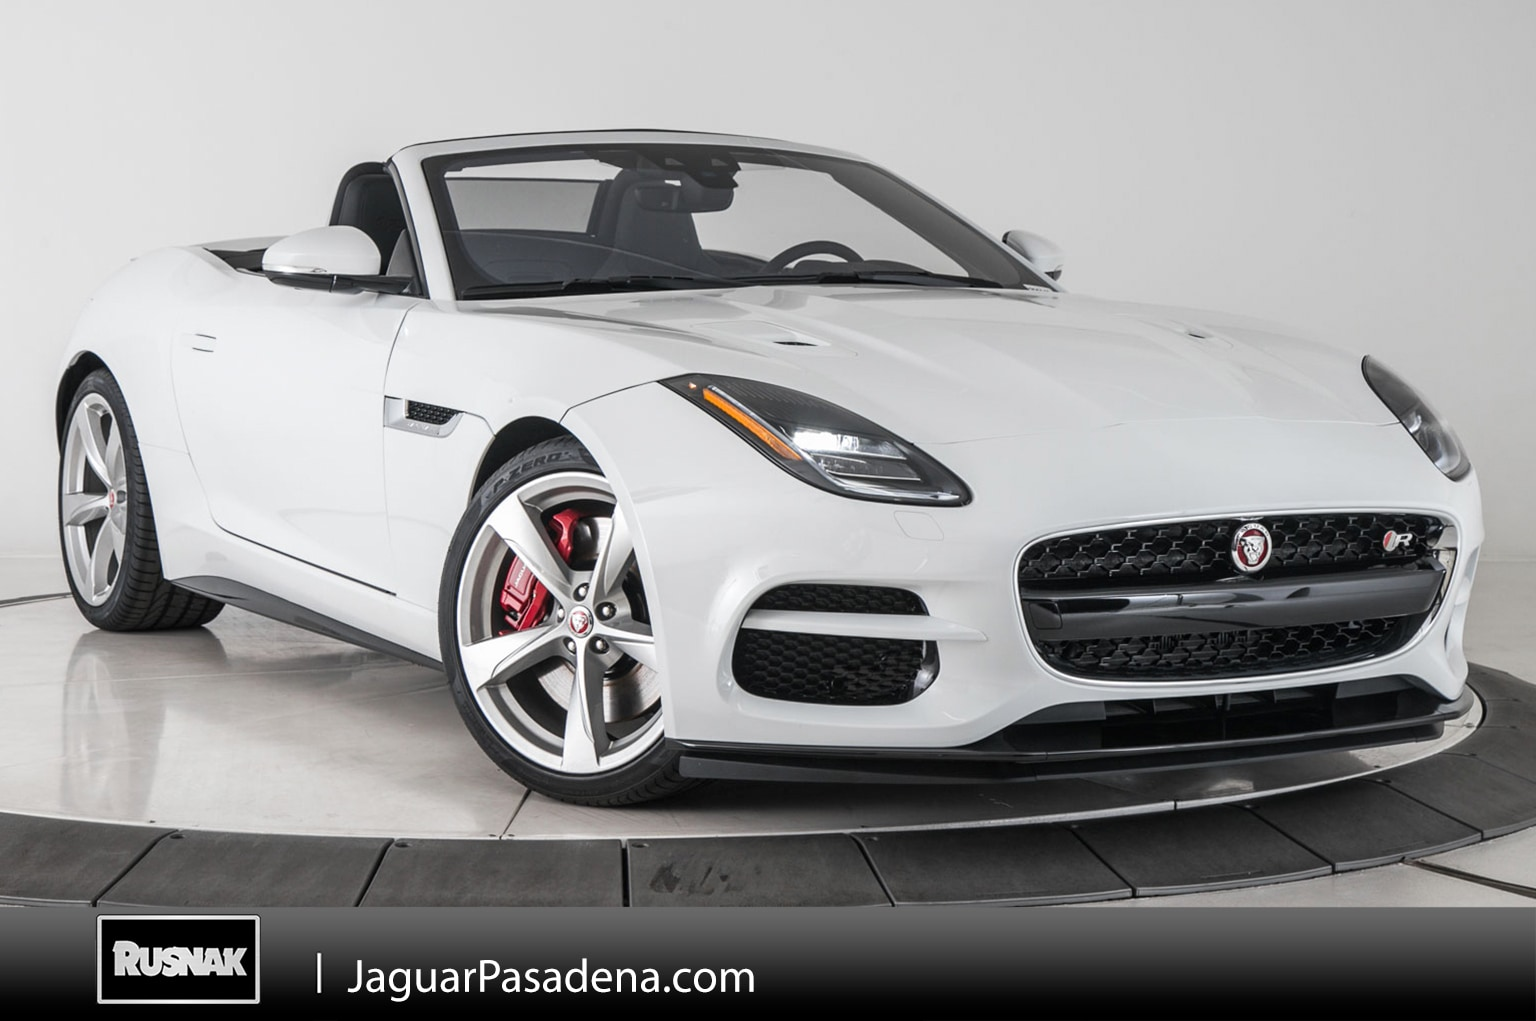 New 2019 Jaguar F-TYPE R Convertible For Sale Los Angeles California